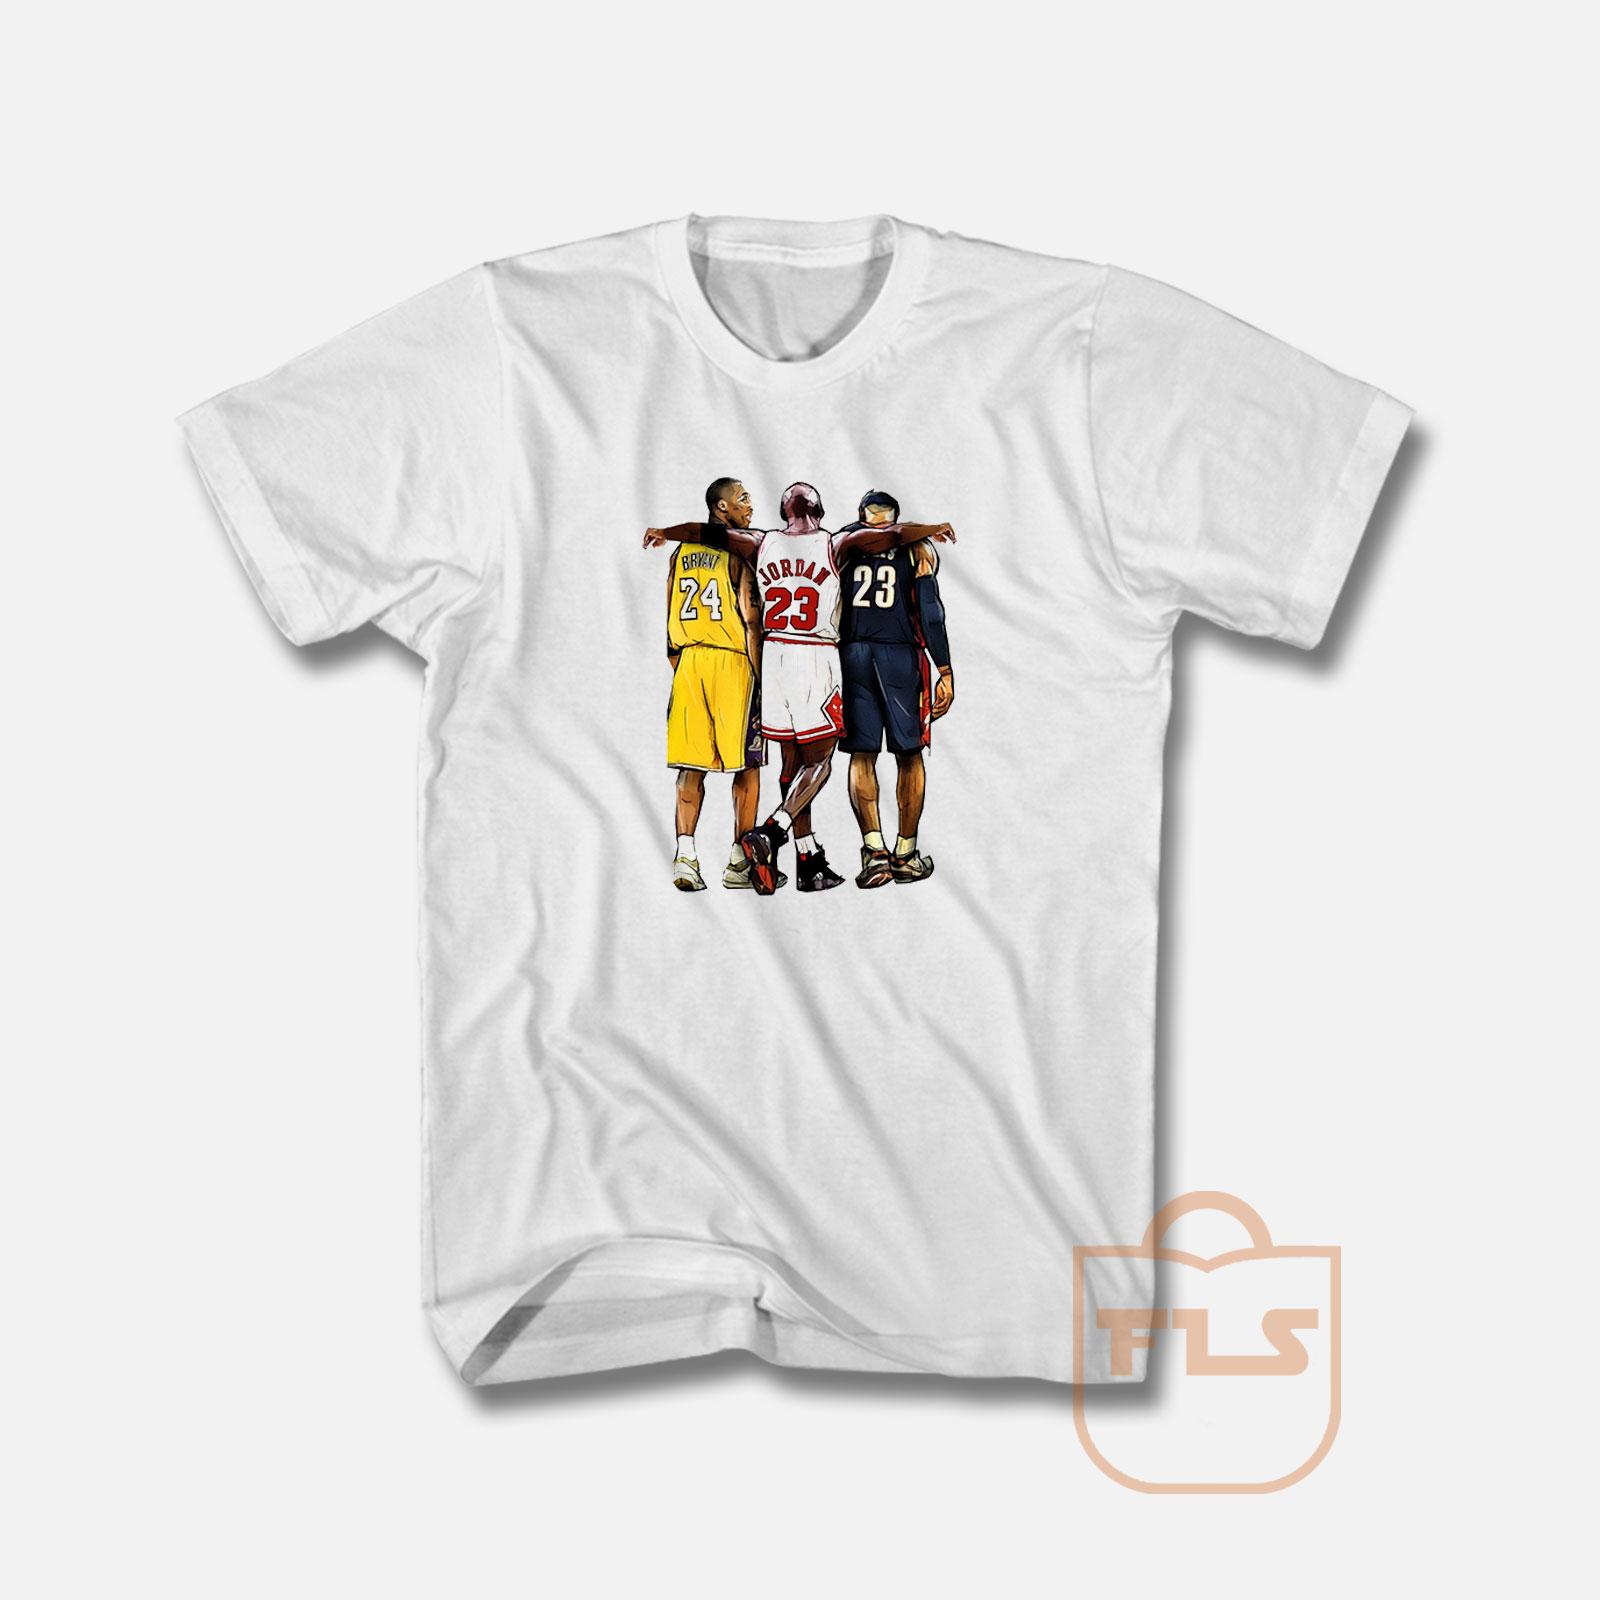 Lebron T Shirt Kobe Bryant x Michael Jordan x Lebron James T Shirt - FEROLOS.COM